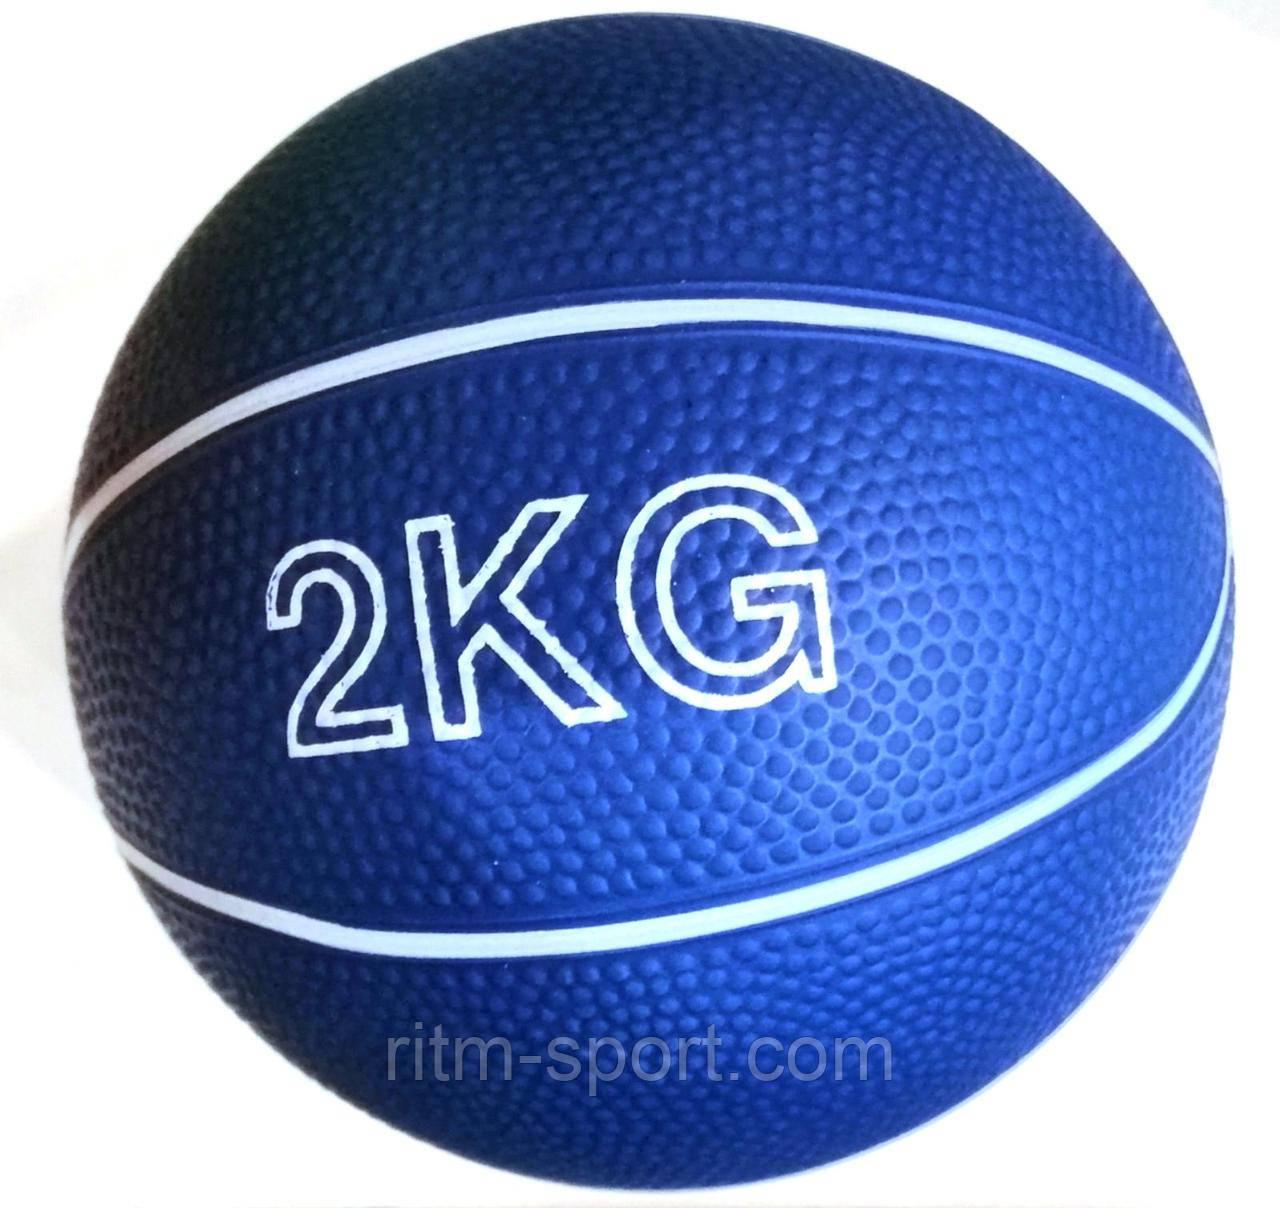 М'яч медичний (медбол) 2 кг